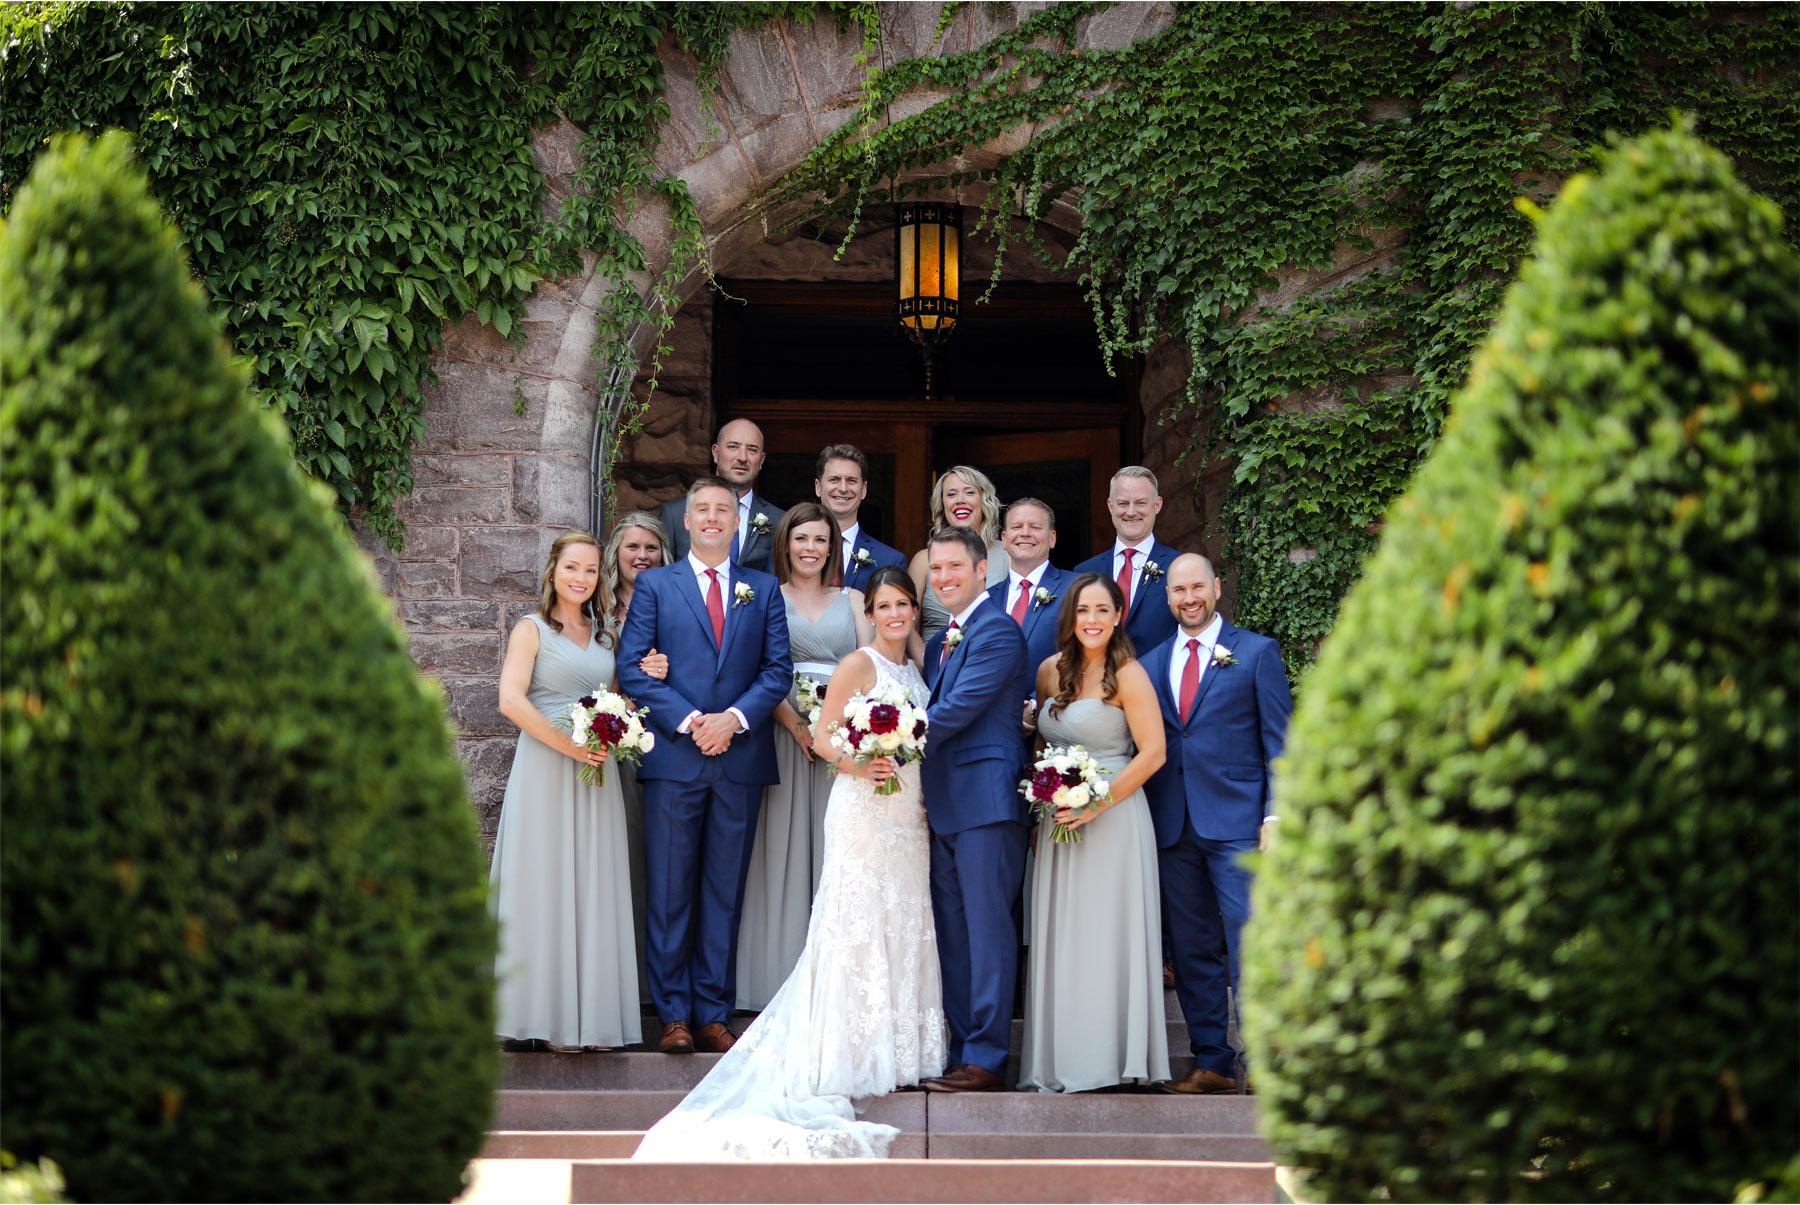 10-Minneapolis-Minnesota-Wedding-Photographer-by-Vick-Photography-Van-Dusen-Mansion-Wedding-Party-Group-Megan-and-Ned.jpg